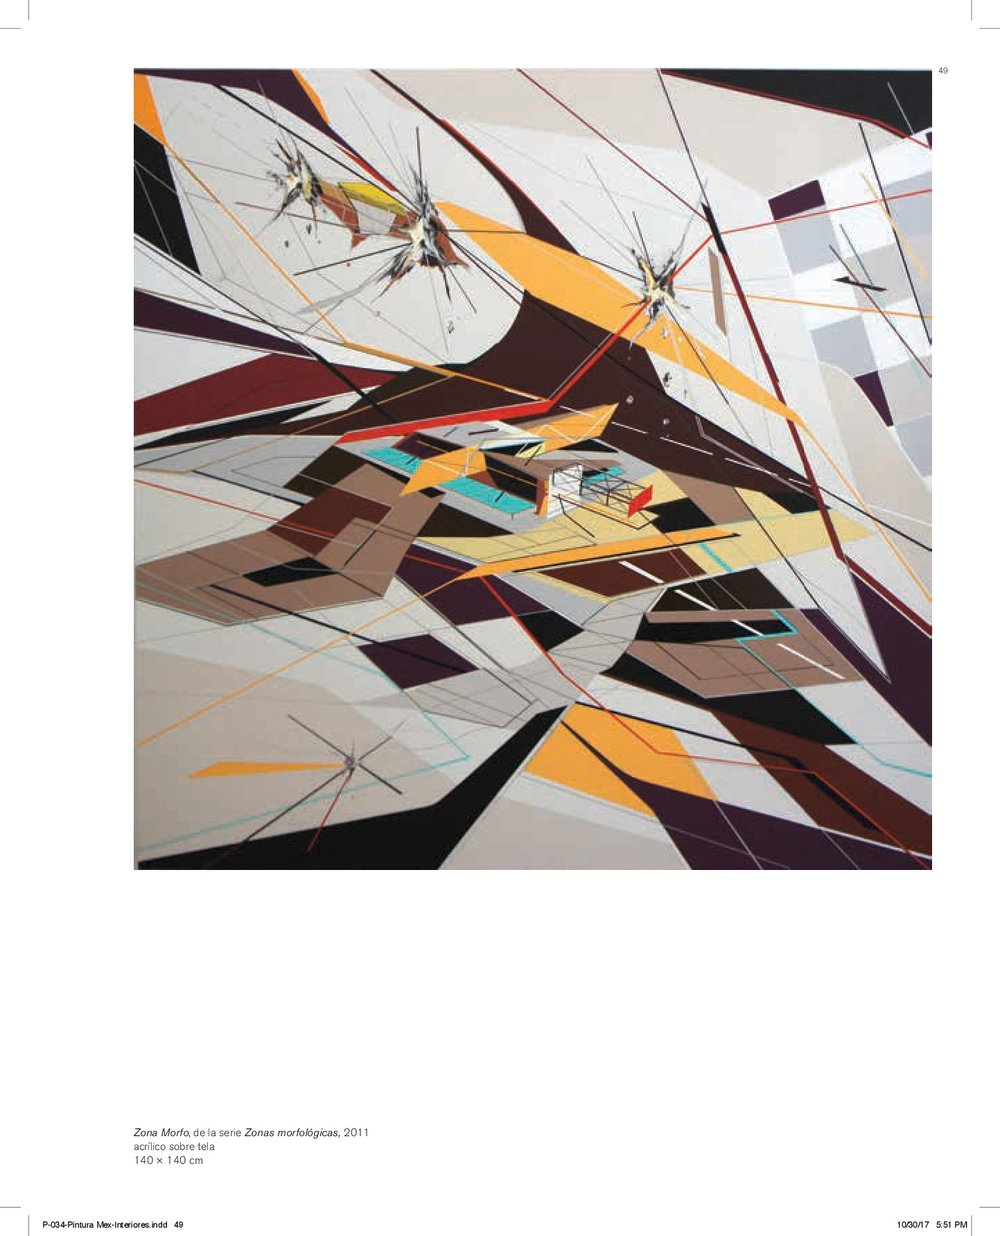 P-034-Pintura-Mex-Interiores-L04-3-049.jpg